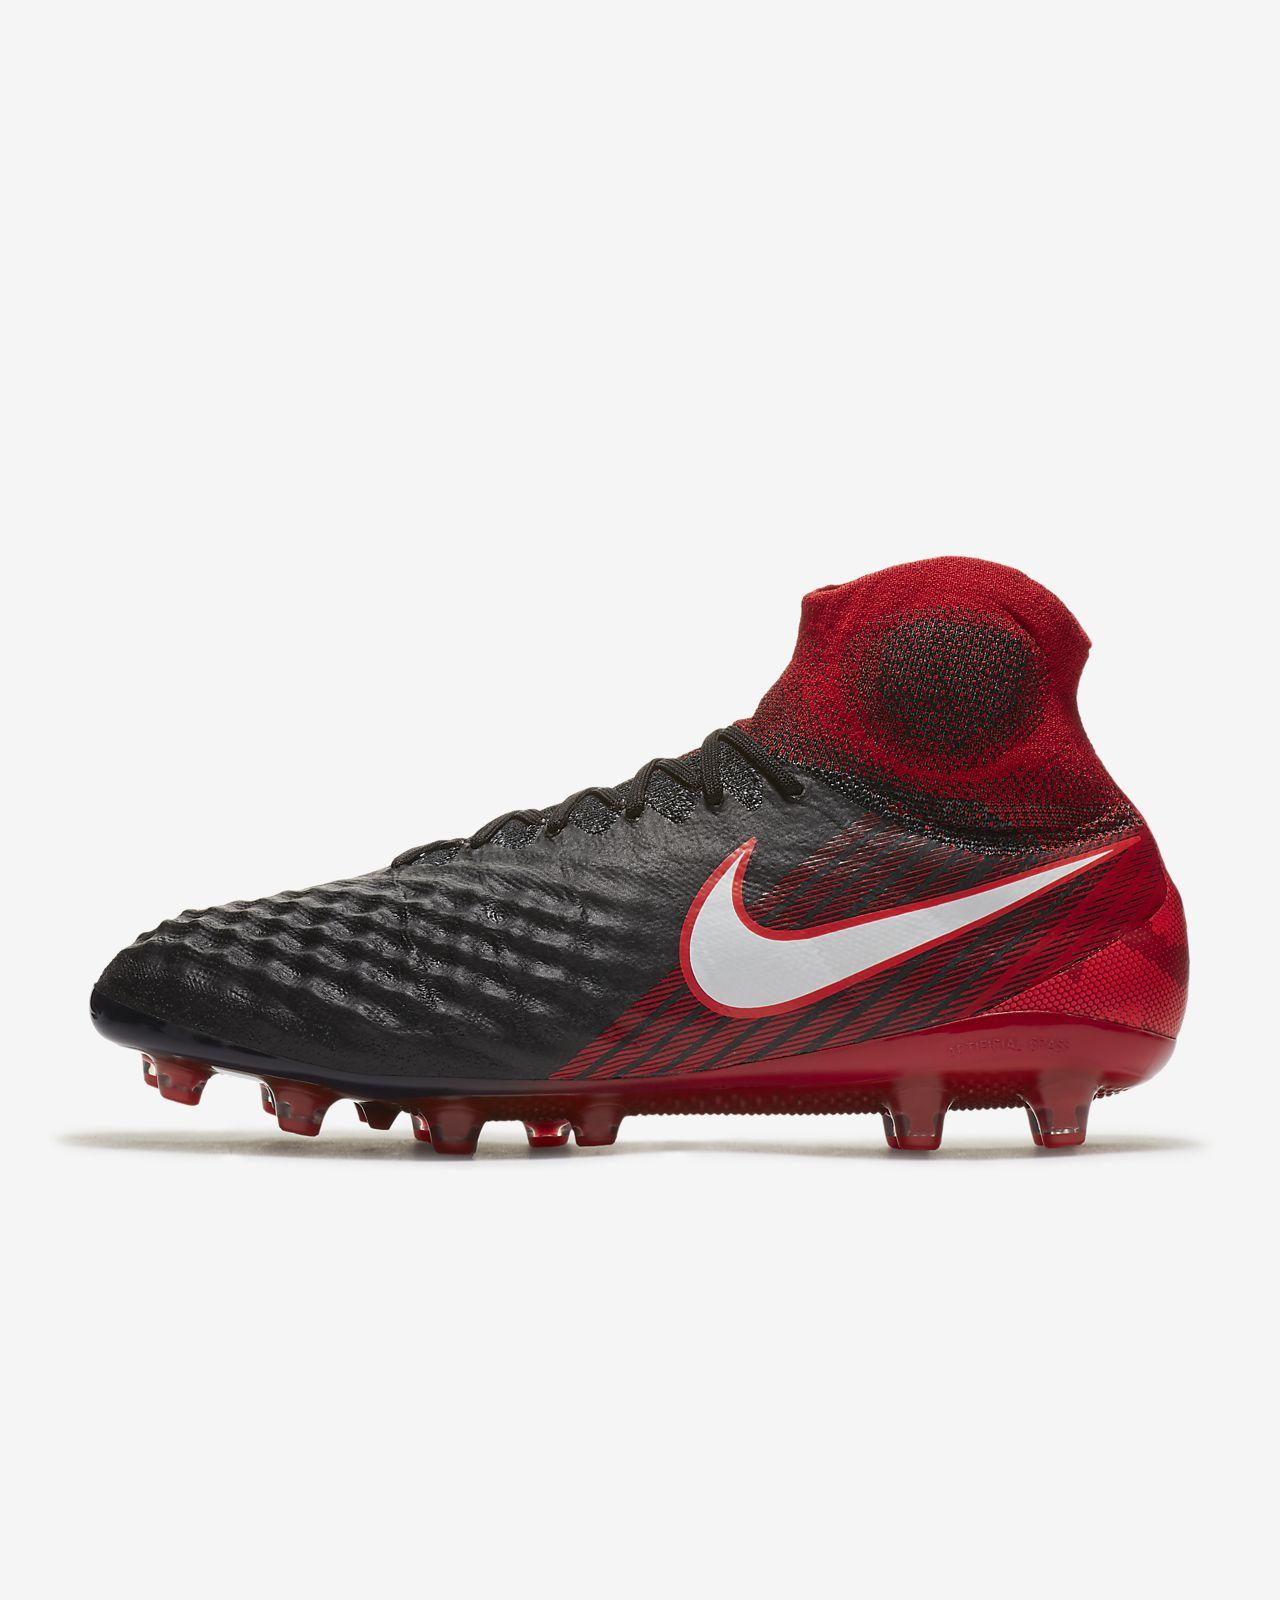 92988aa6bd27 2017 nike magista obra ii fg football boots grey red black sale; nike  magista obra ii ag pro artificial grass football boot